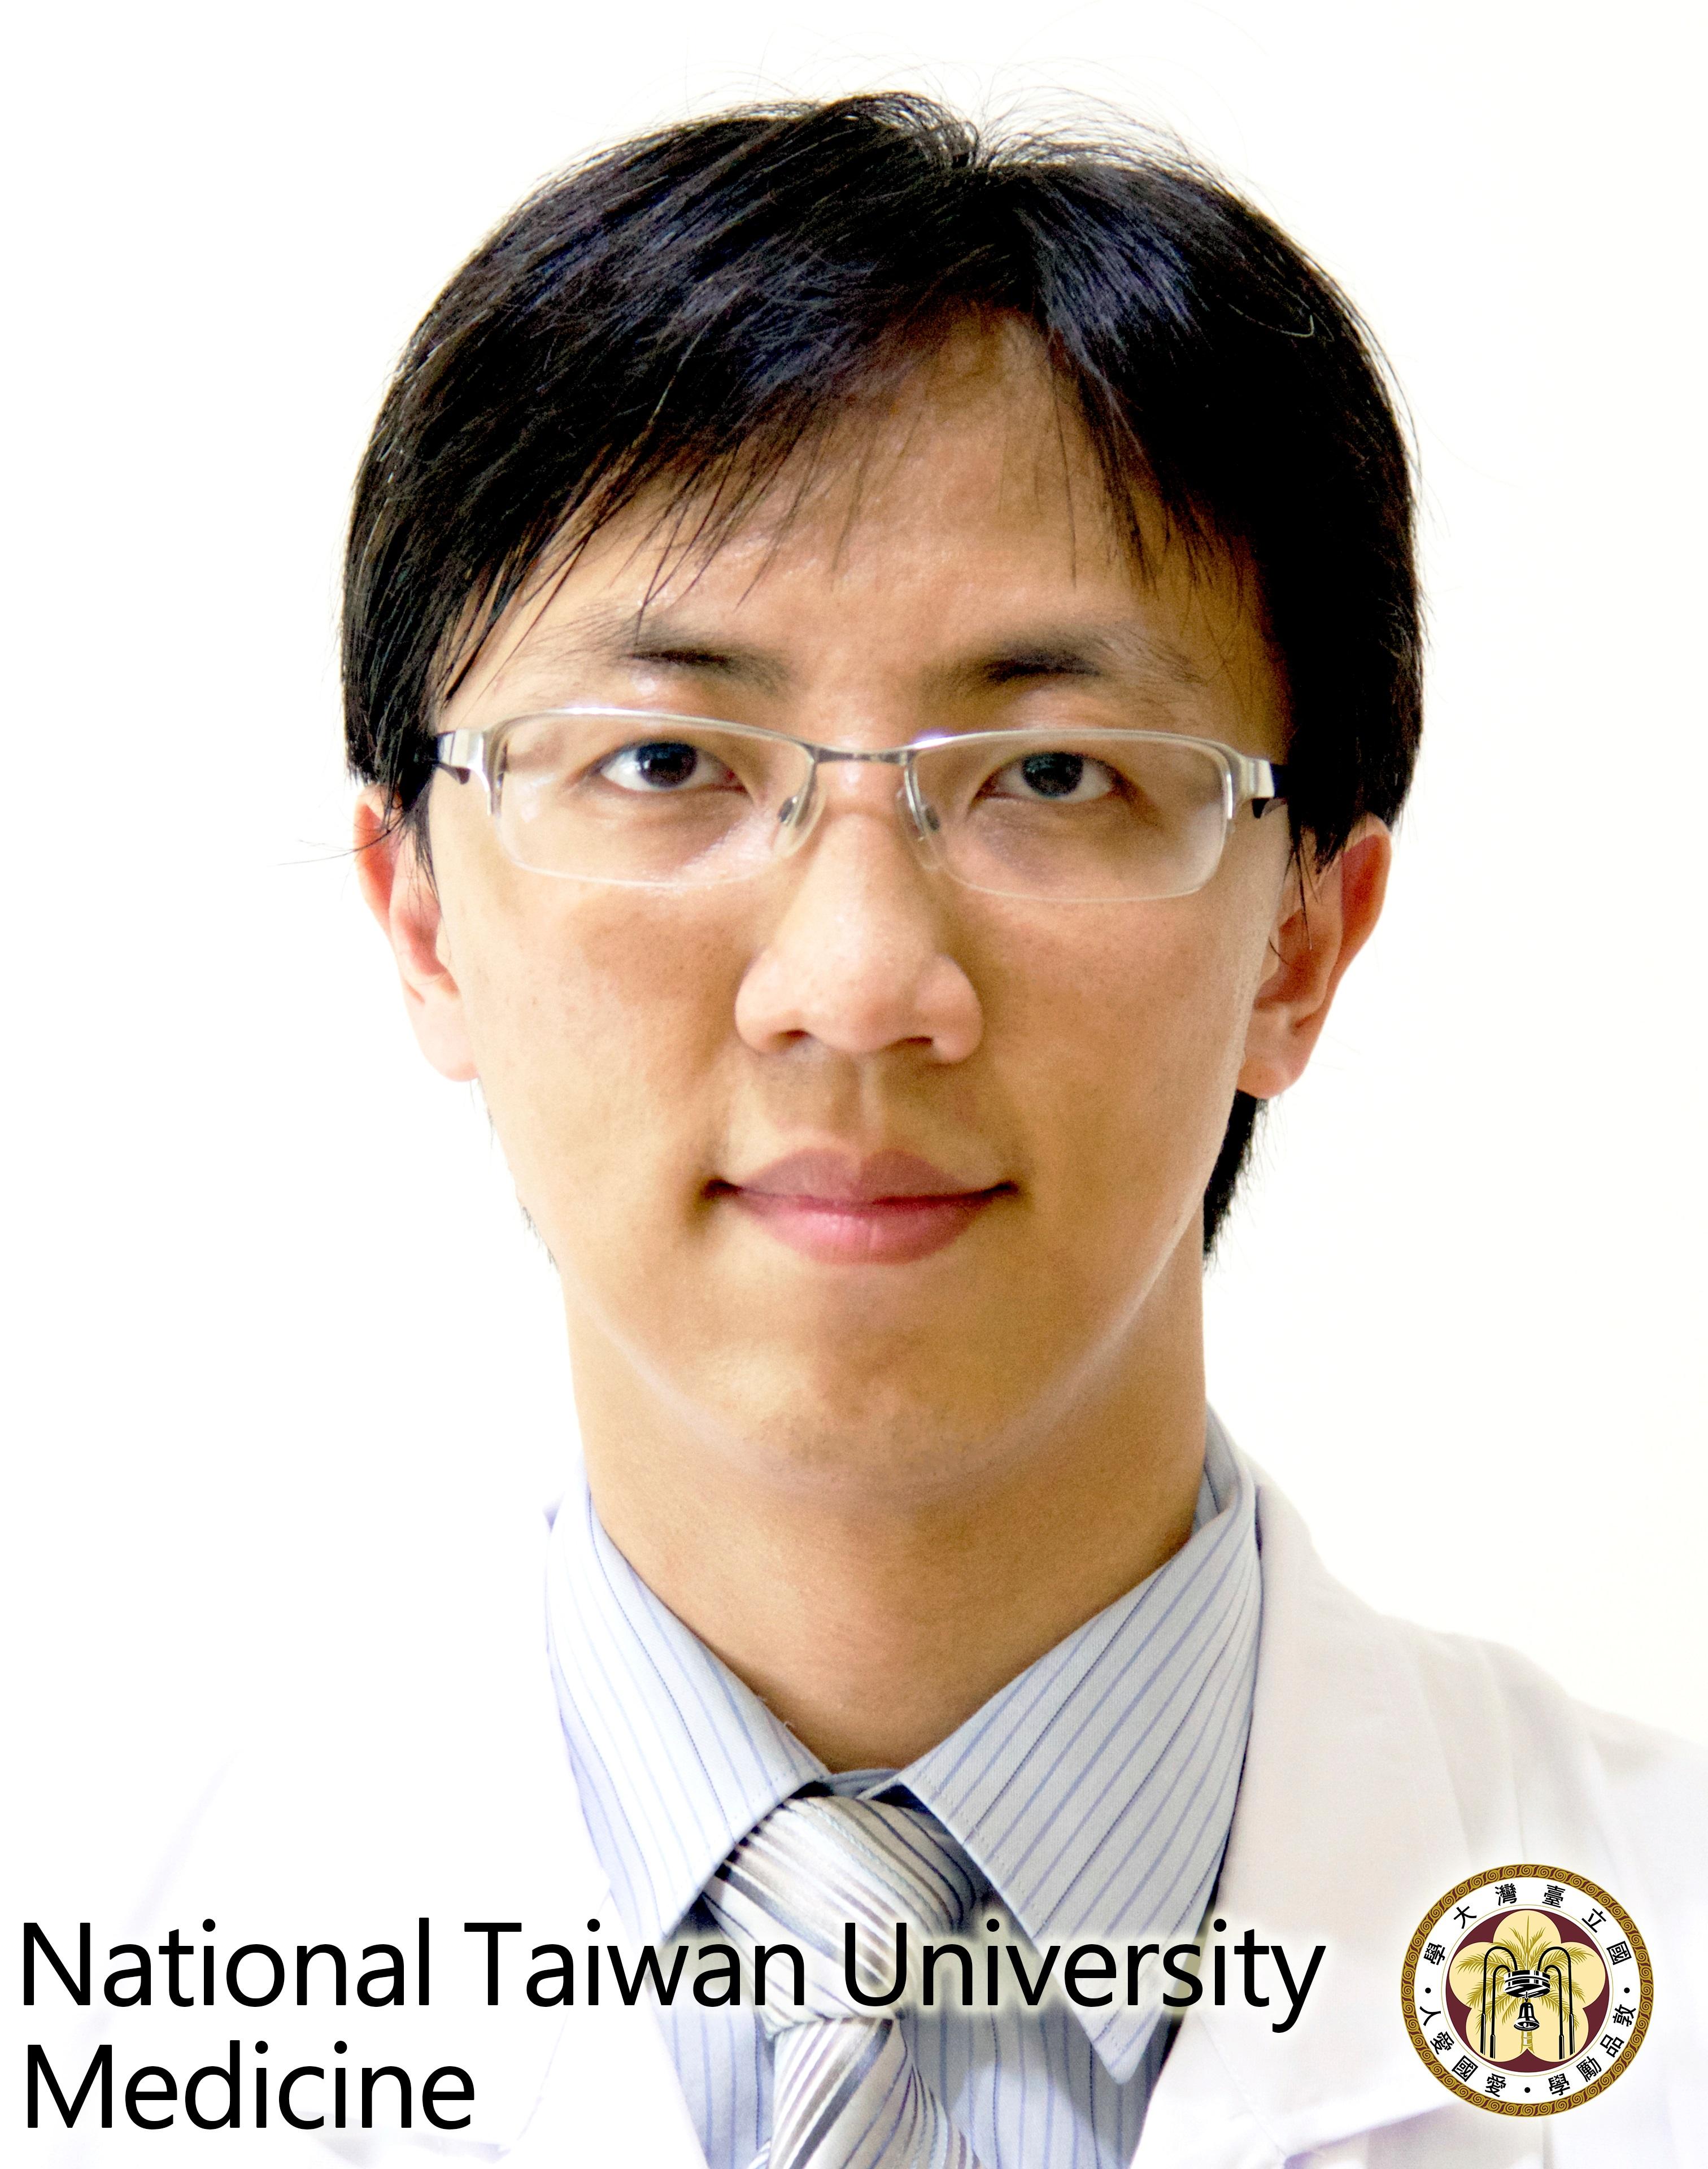 Co-Founder王奐之 醫師(Jesse Wang, MD) 王奐之 醫師在國立台灣大學獲得醫學博士學位。他是國立台灣大學醫院的主治神經外科醫生,擁有10多年的經驗。他在國立台灣大學醫院進行住院醫師培訓。他還是國立交通大學的博士候選人。